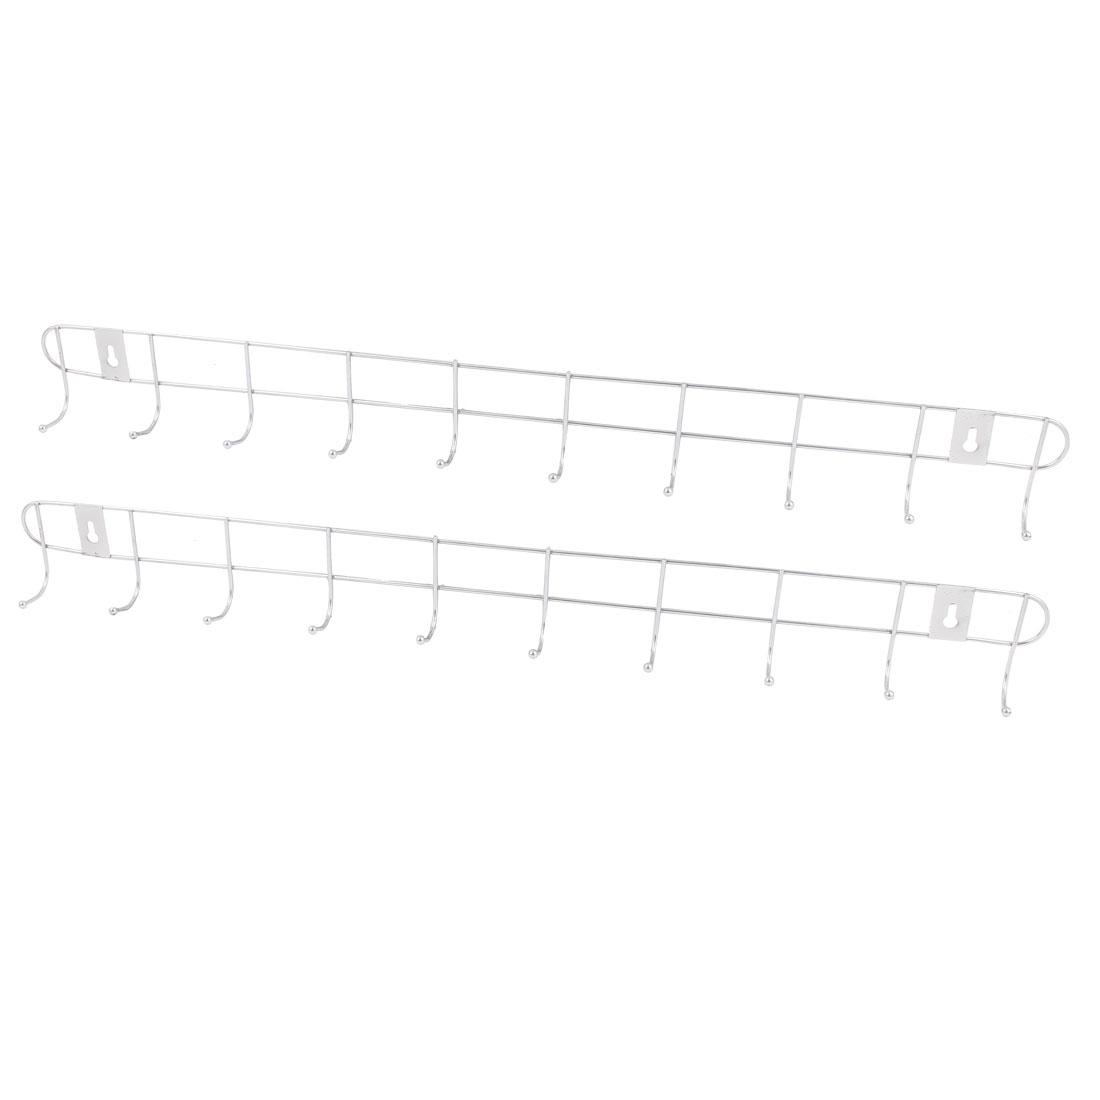 Home Bedroom Bathroom Hat Coat Towel Wall Mounted Metal 10 Hooks Hanger Rack Holder 2PCS